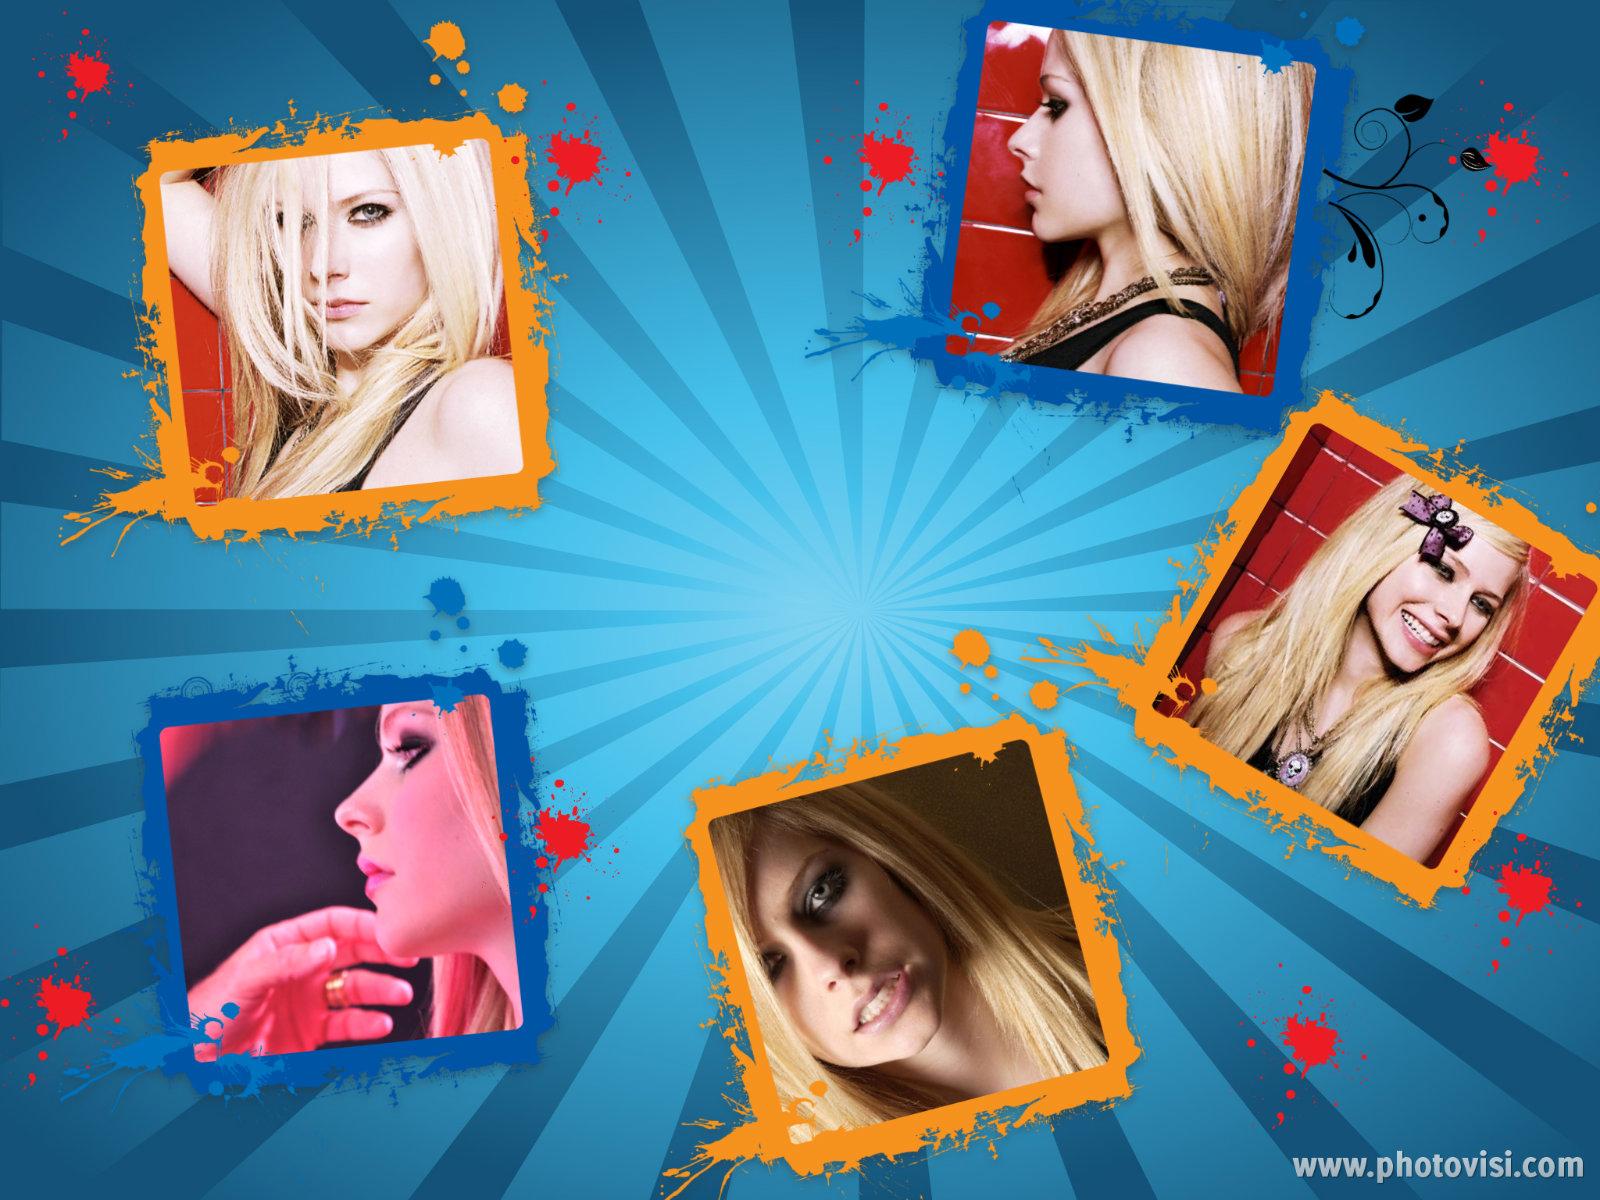 http://4.bp.blogspot.com/_bQCvM-noHhc/TKpT3JEjaaI/AAAAAAAAA6c/t4-rzg8-h24/s1600/FF723E0A-98E2-B832-4F26-E4E86A5FD1FAwallpaper.jpg